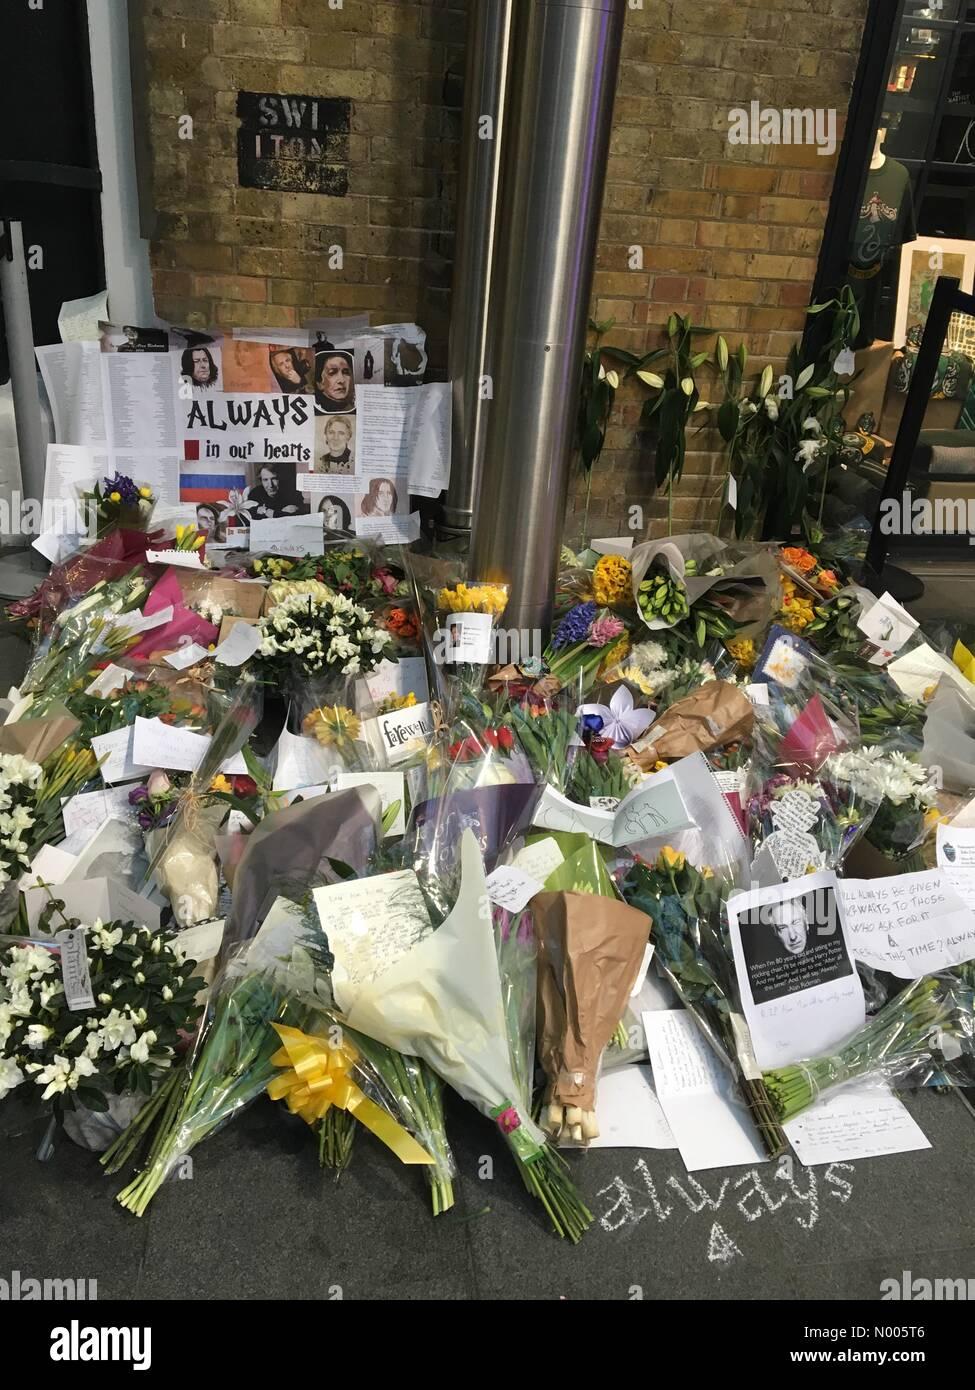 Flowers for Alan Rickman at Kings Cross - Stock Image